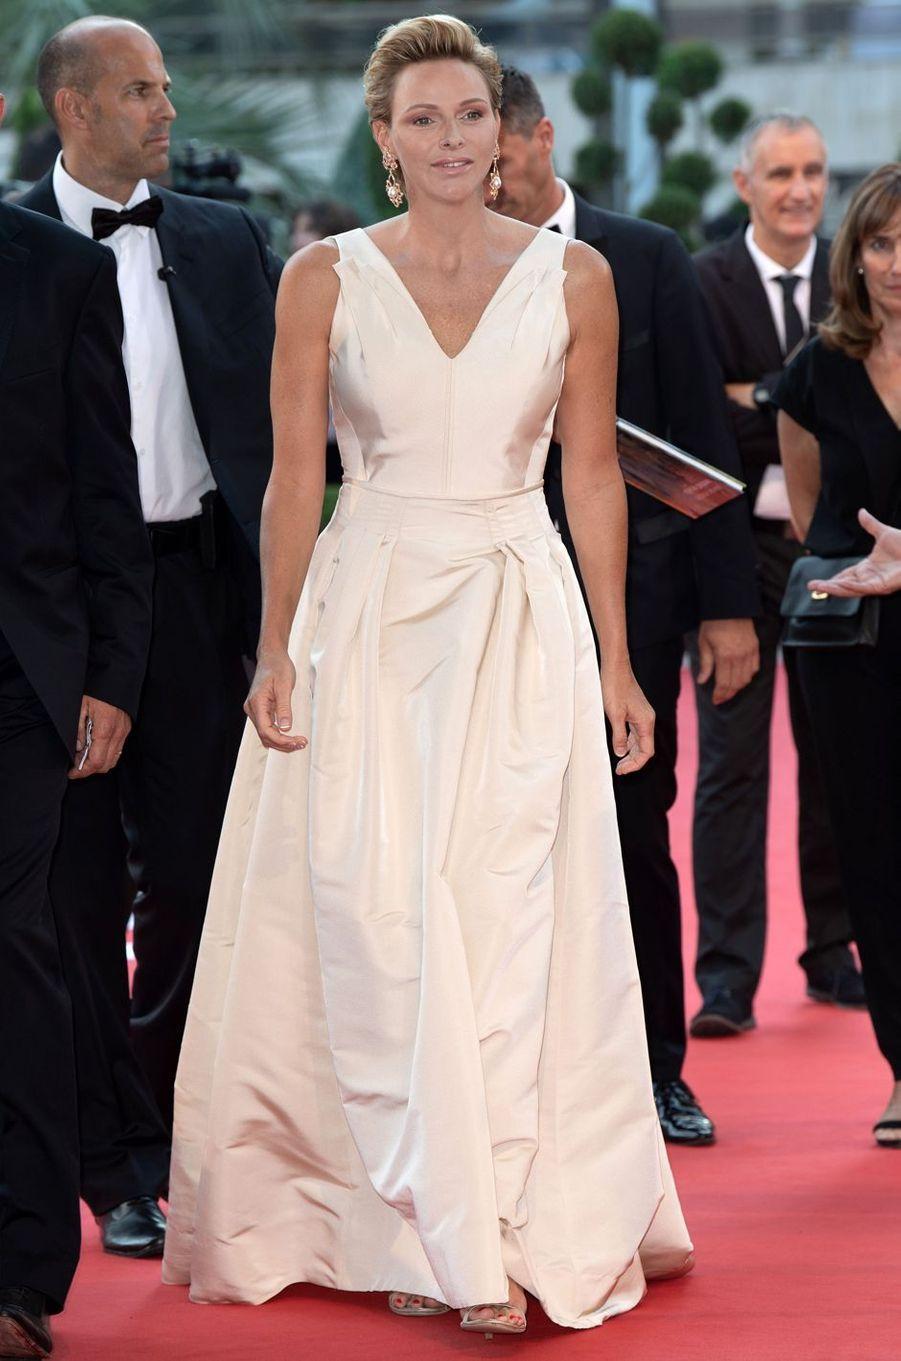 La princesse Charlène de Monaco en Carolina Herrera au Festival de télévision de Monte-Carlo, le 19 juin 2018